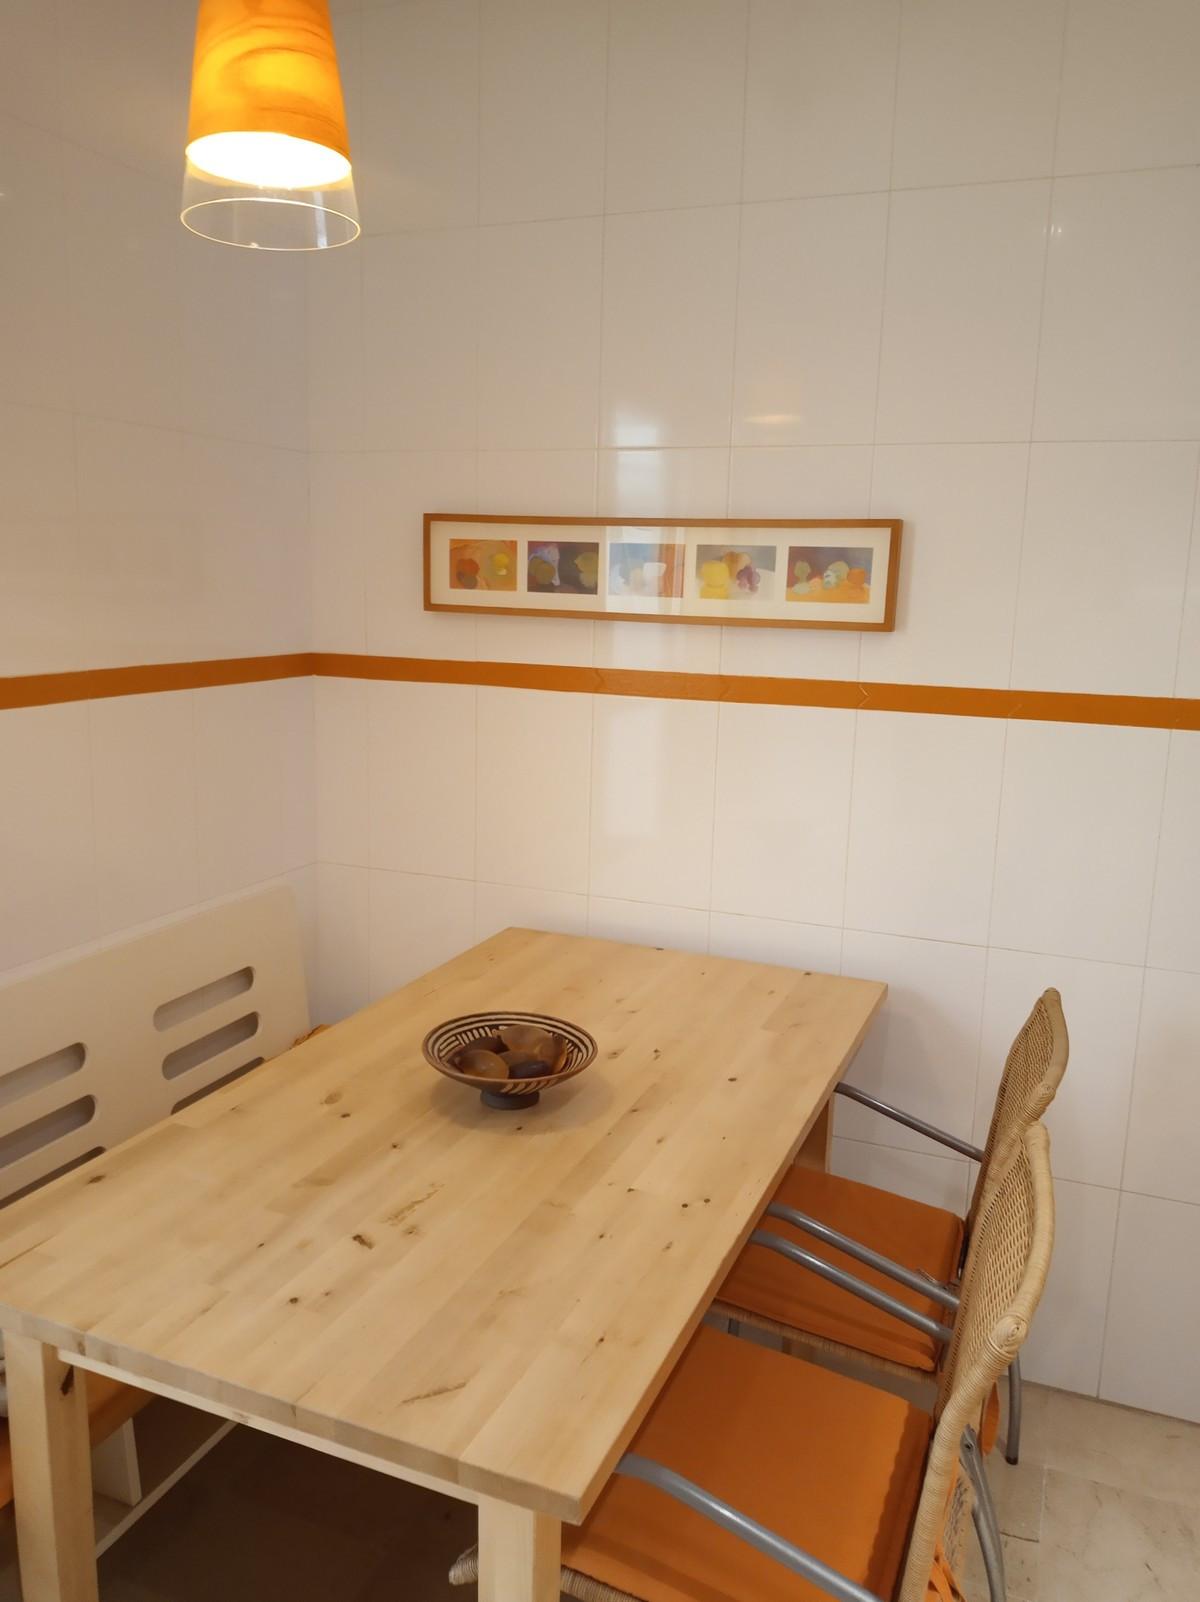 Qlistings - Apartment in Cancelada, Costa del Sol Property Image